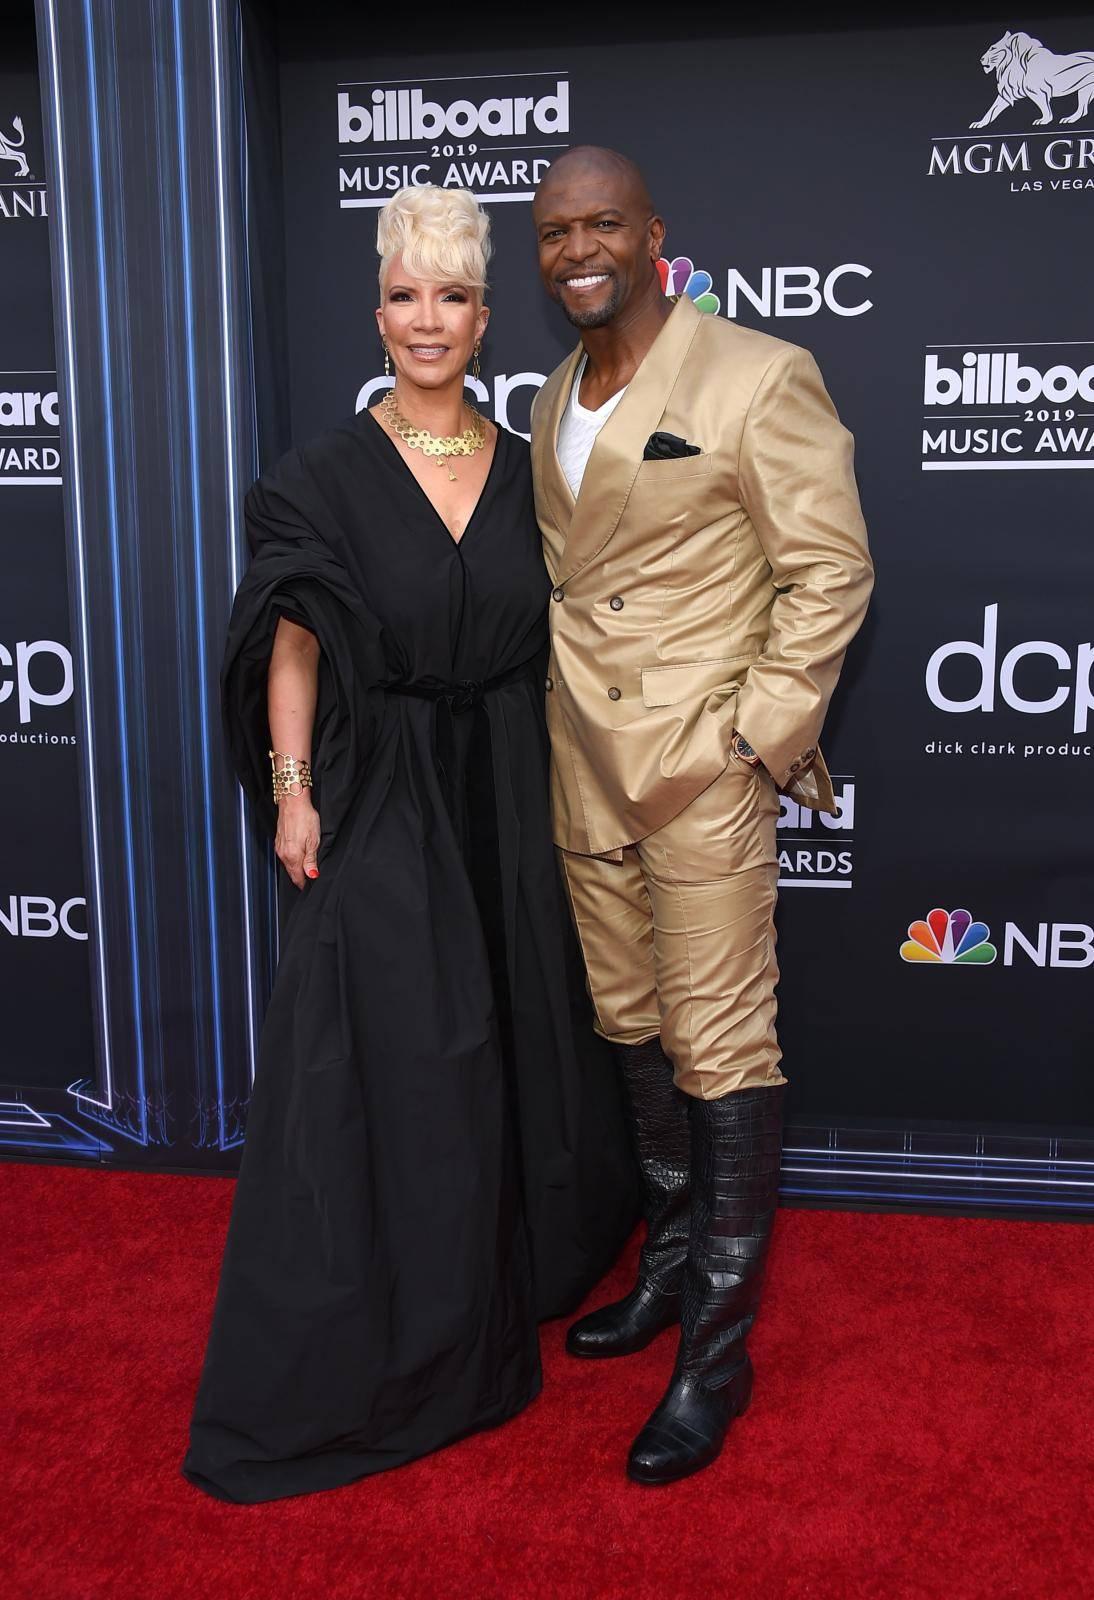 Billboard Music Awards 2019 - Arrivals - Las Vegas